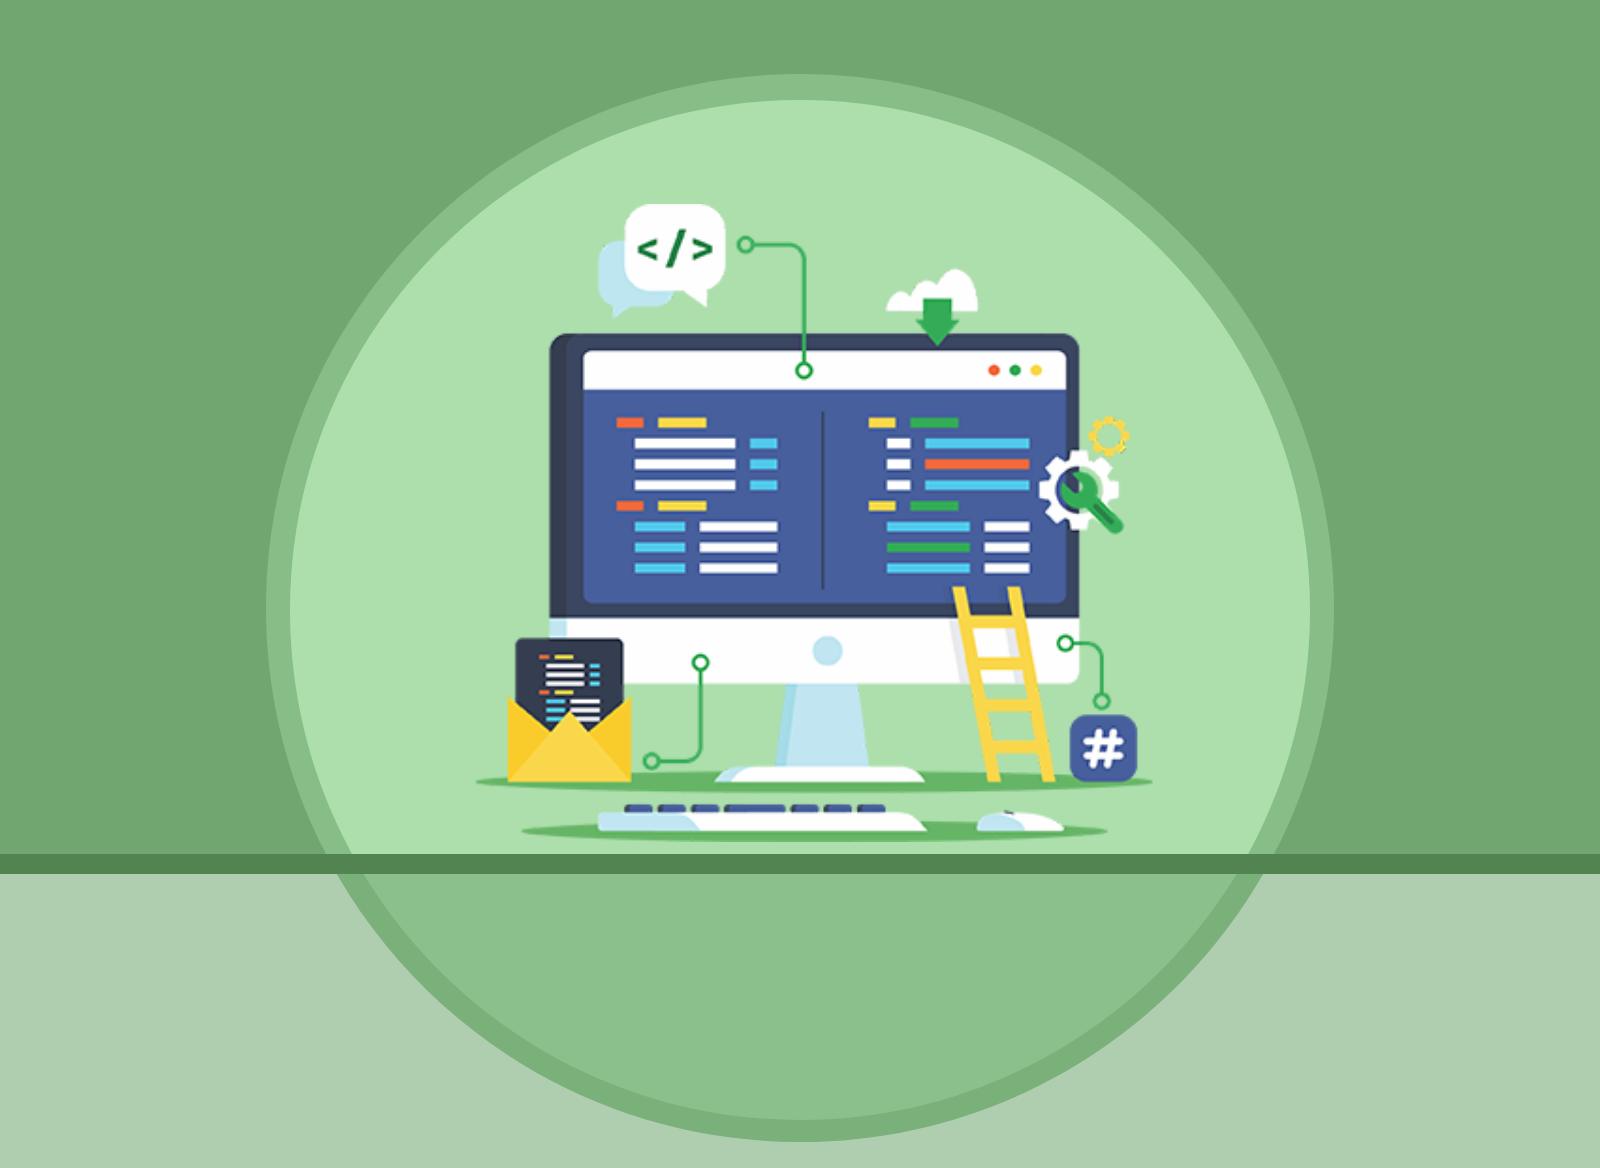 10 Benefits of Open Source Technology for Enterprises